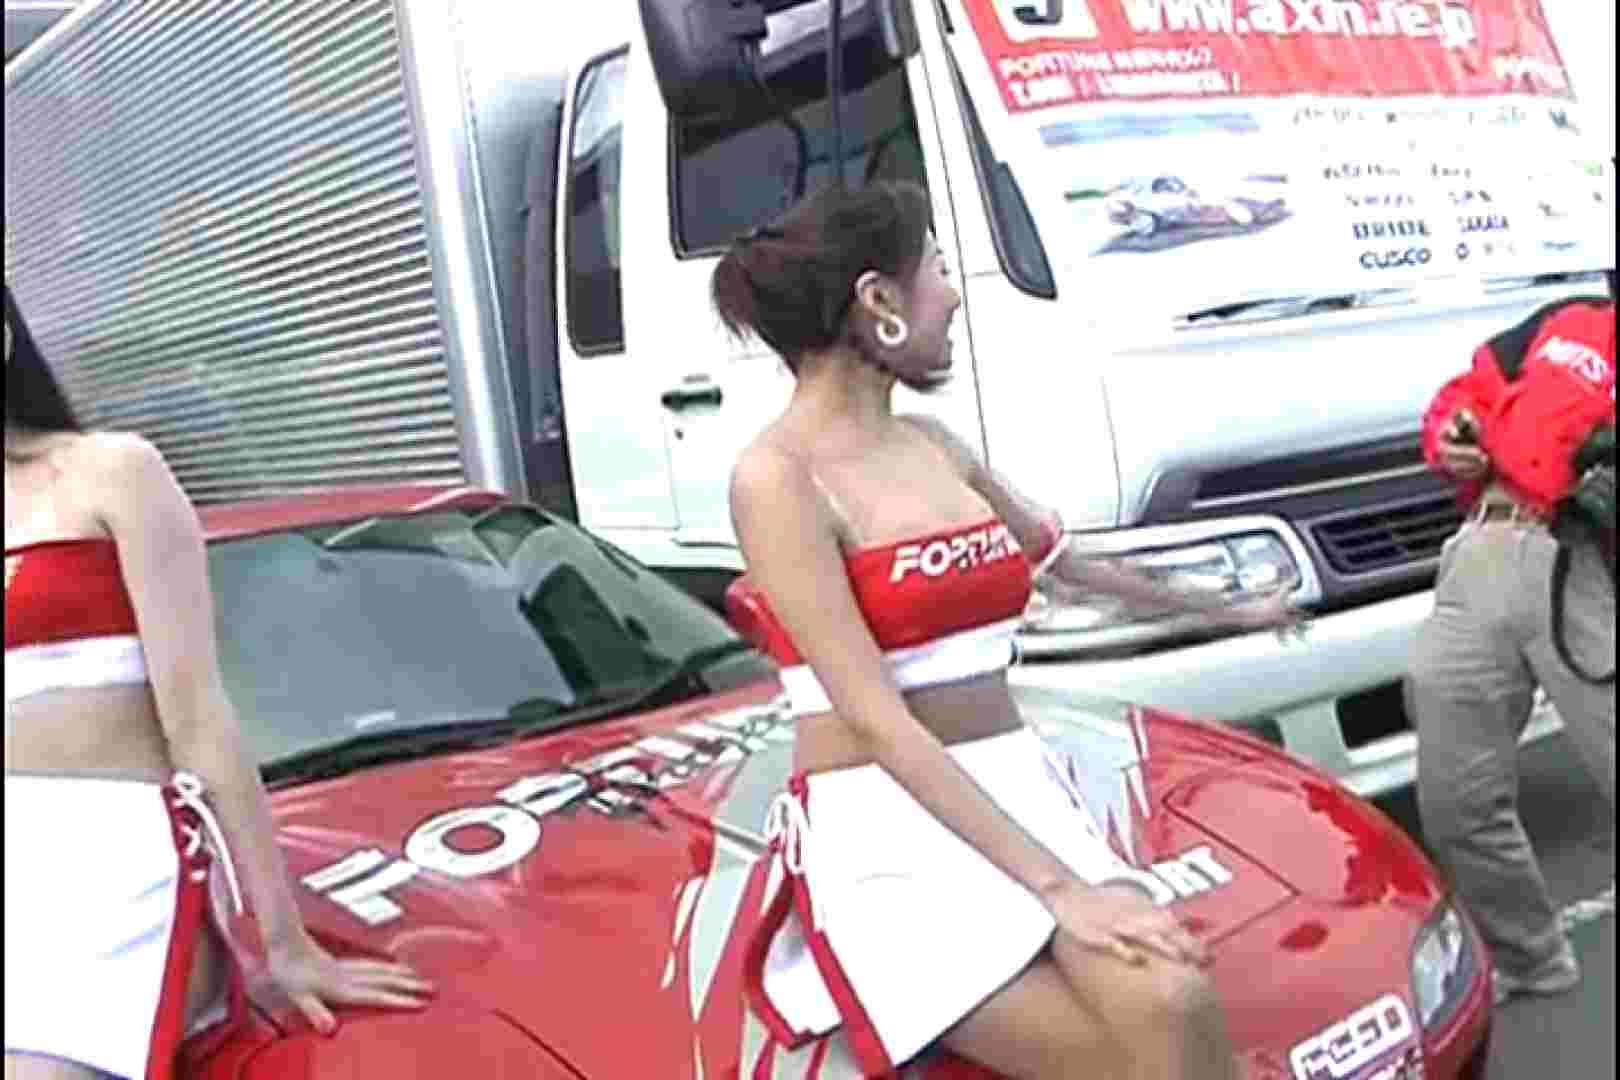 RQカメラ地獄Vol.11 レースクイーン編 セックス無修正動画無料 86画像 65